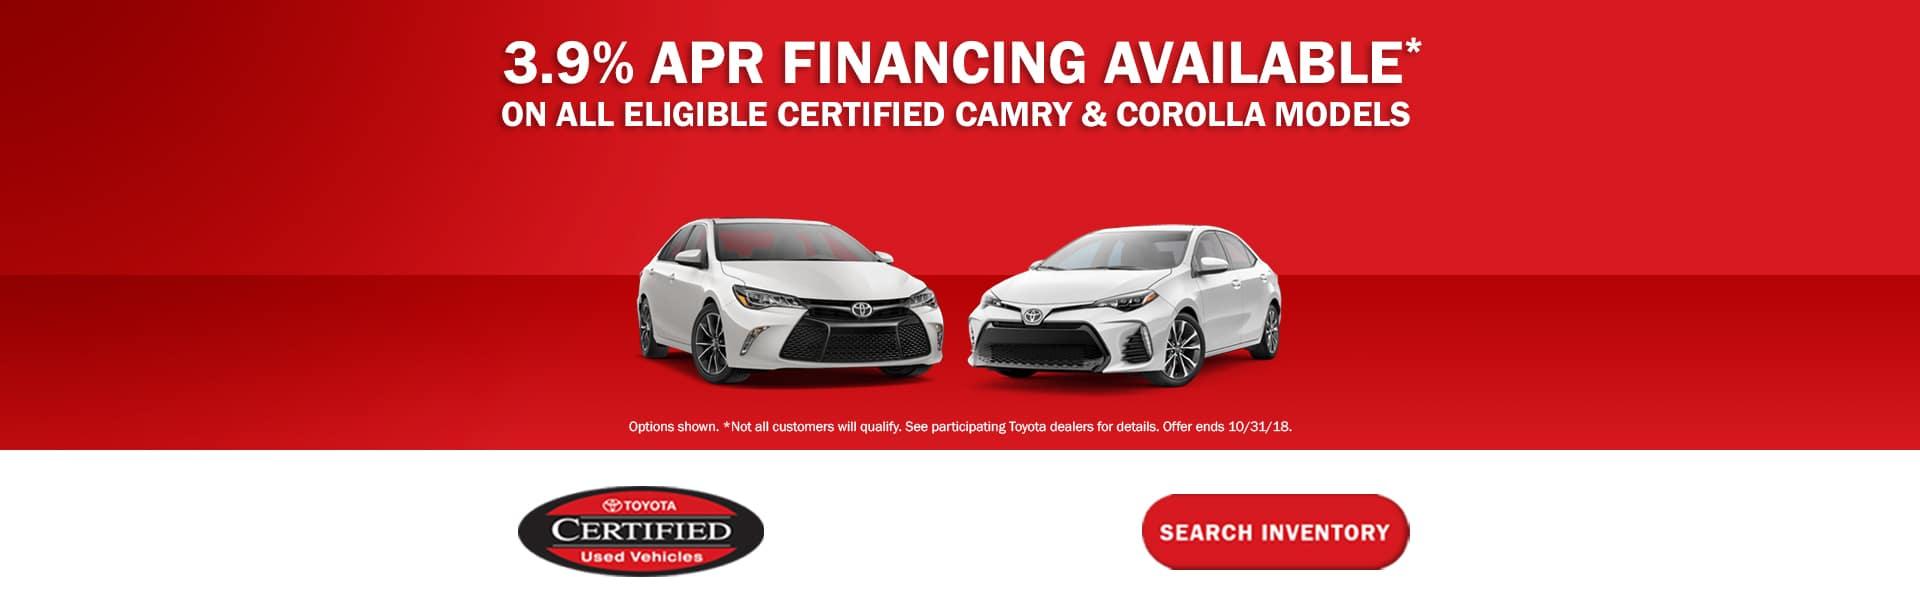 3.9% APR Financing